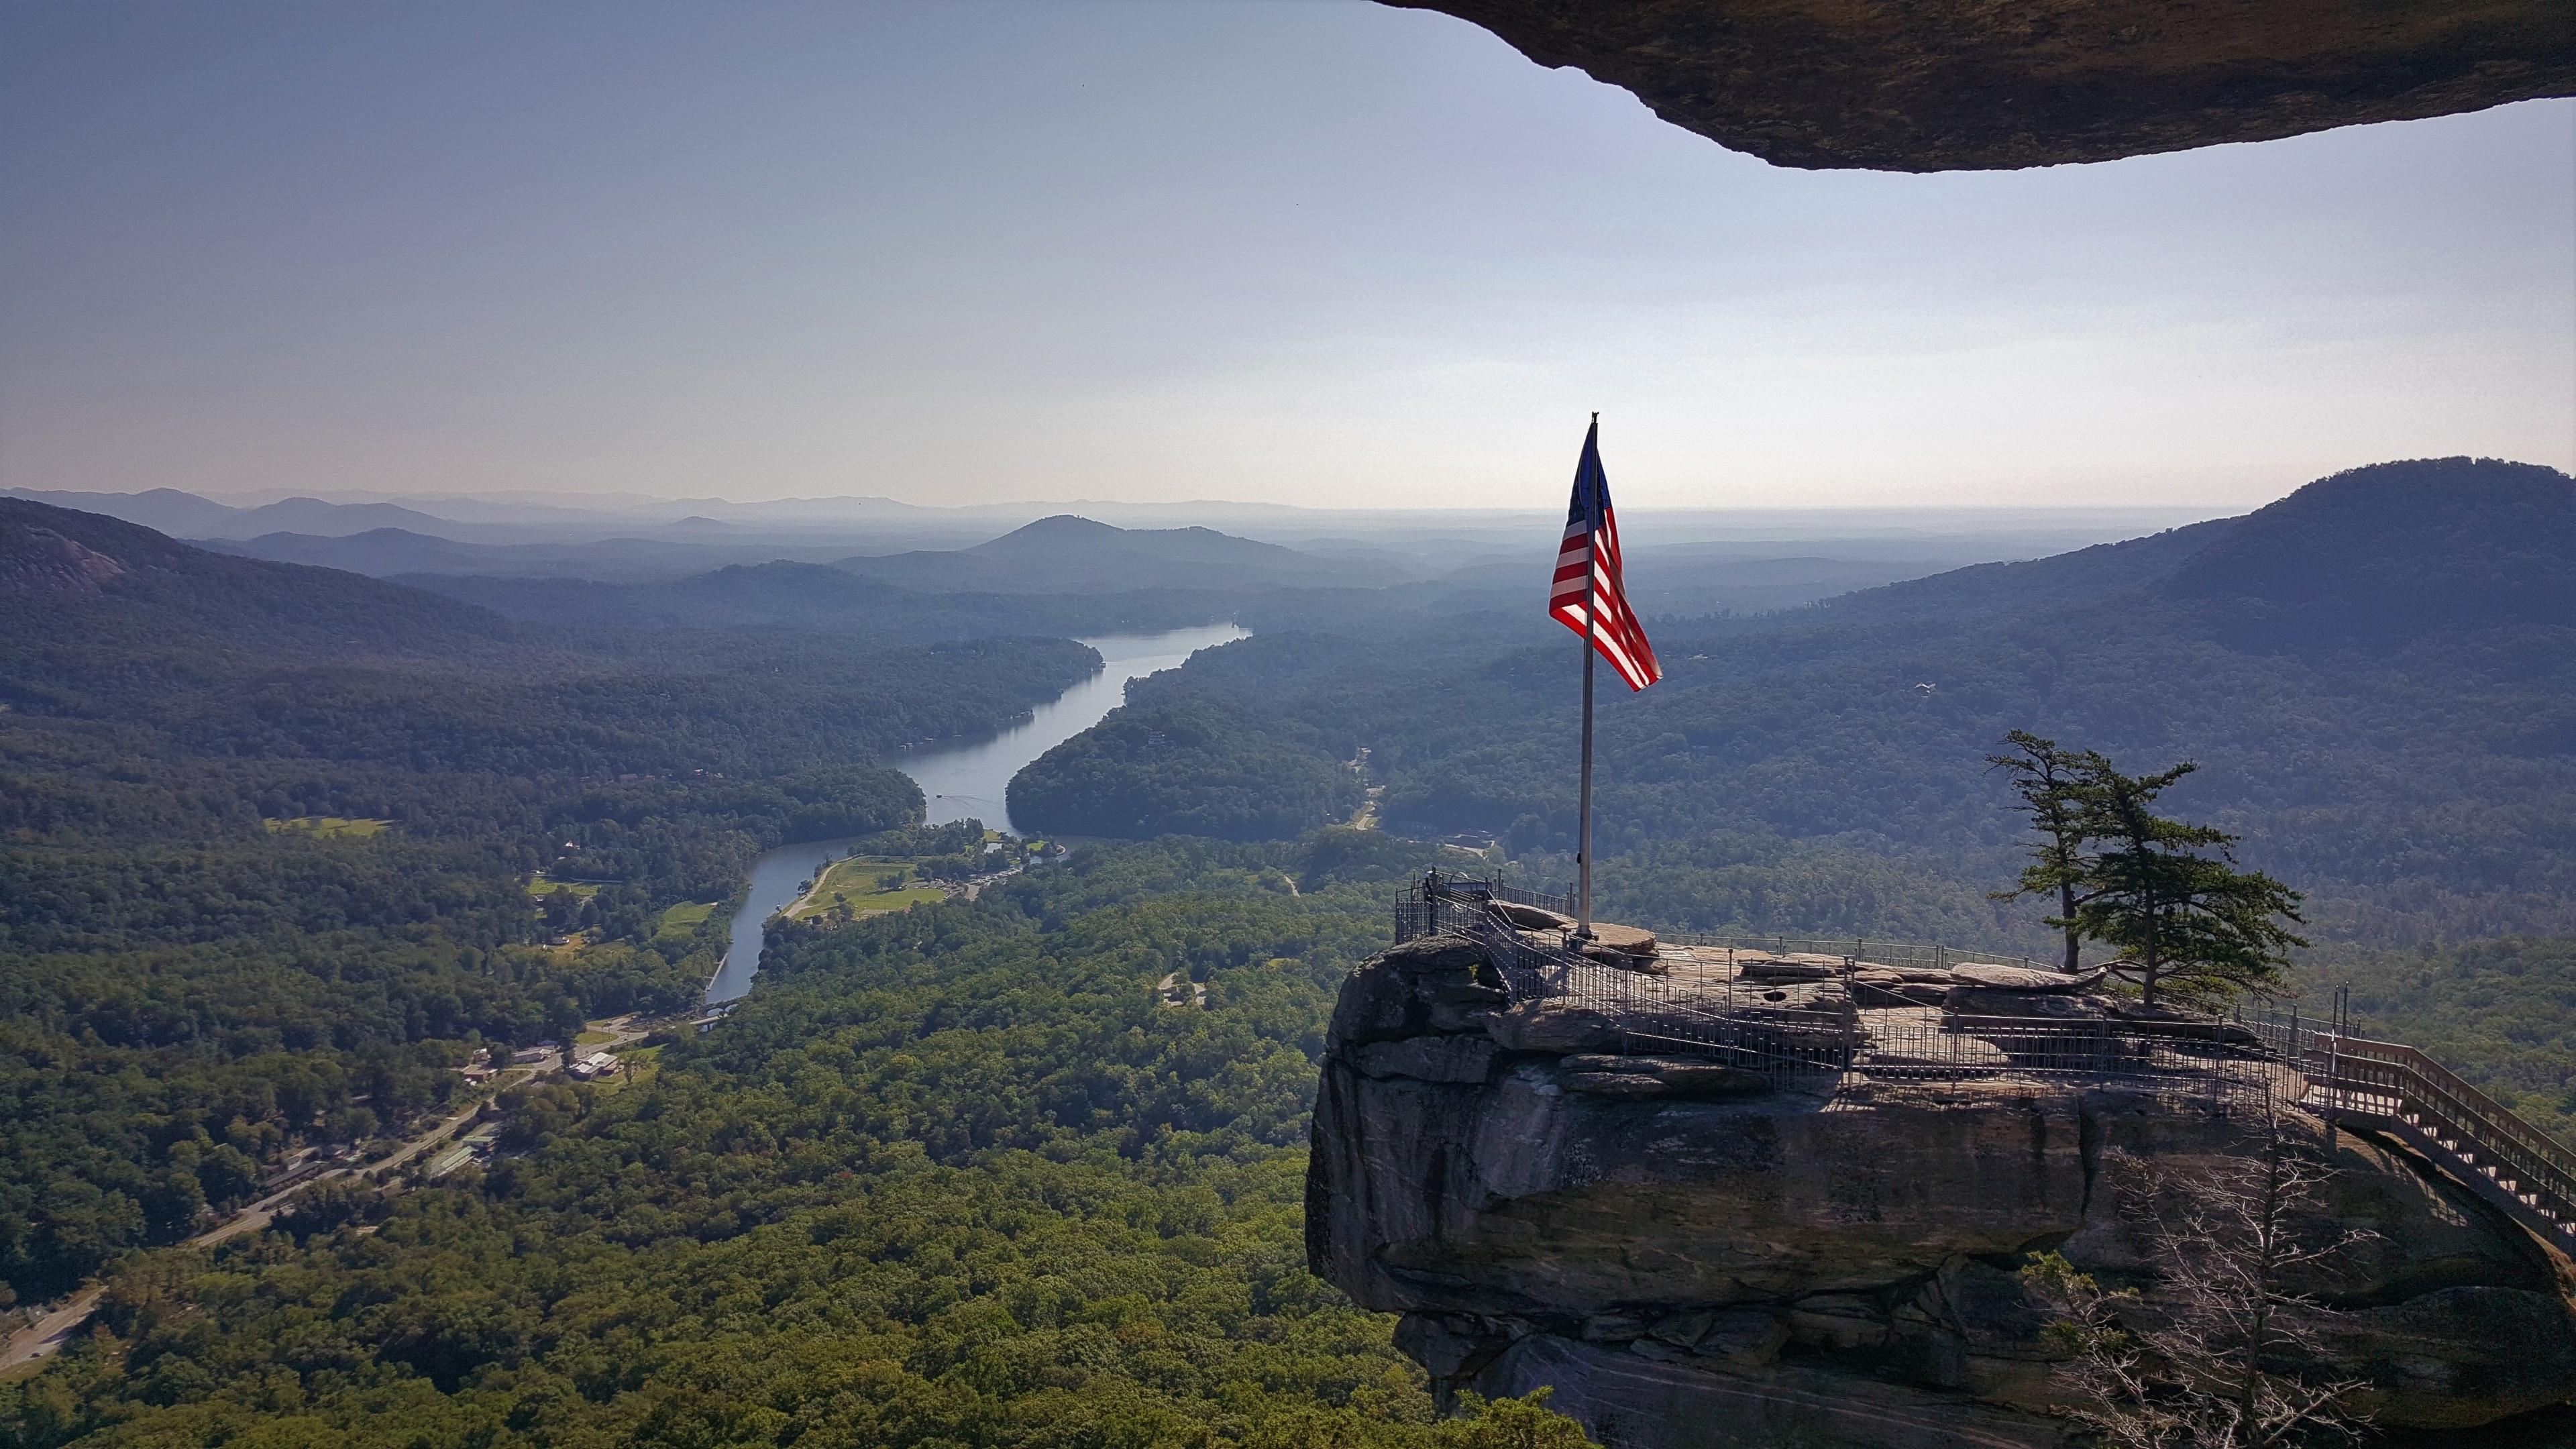 Chimney Rock State Park, North Carolina, USA